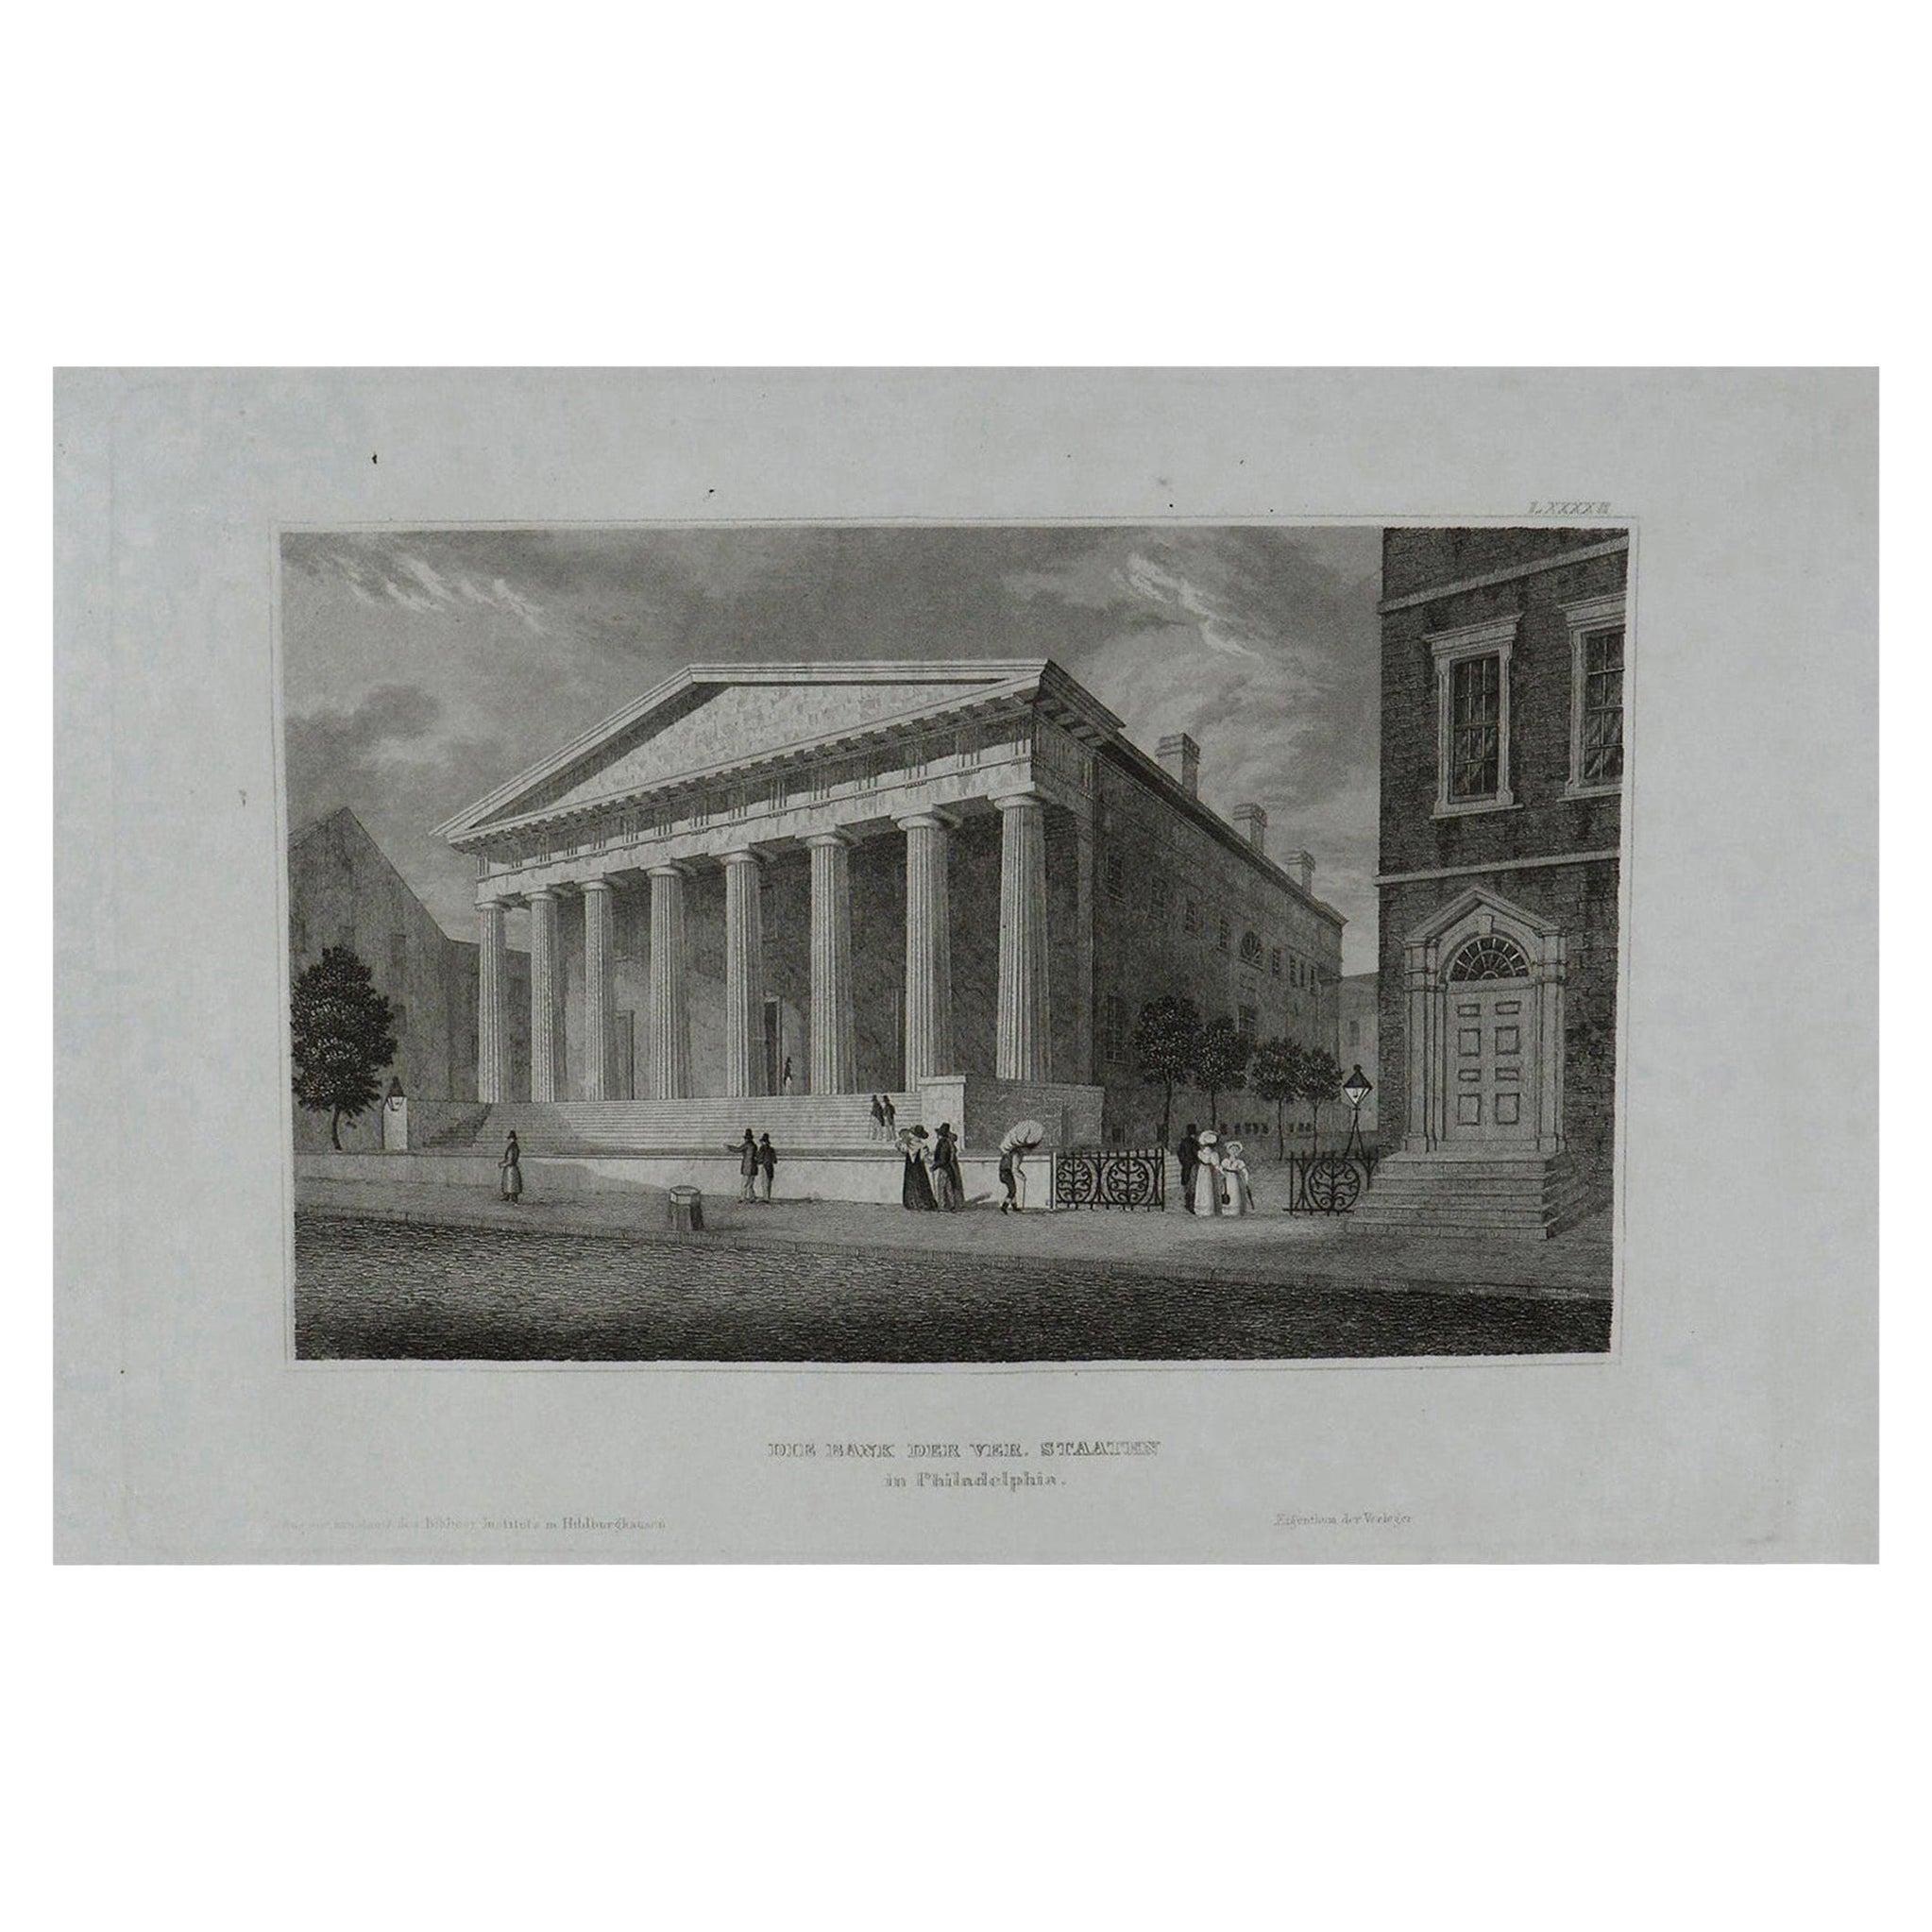 Original Antique Print of Philadelphia, Pennsylvania, circa 1840